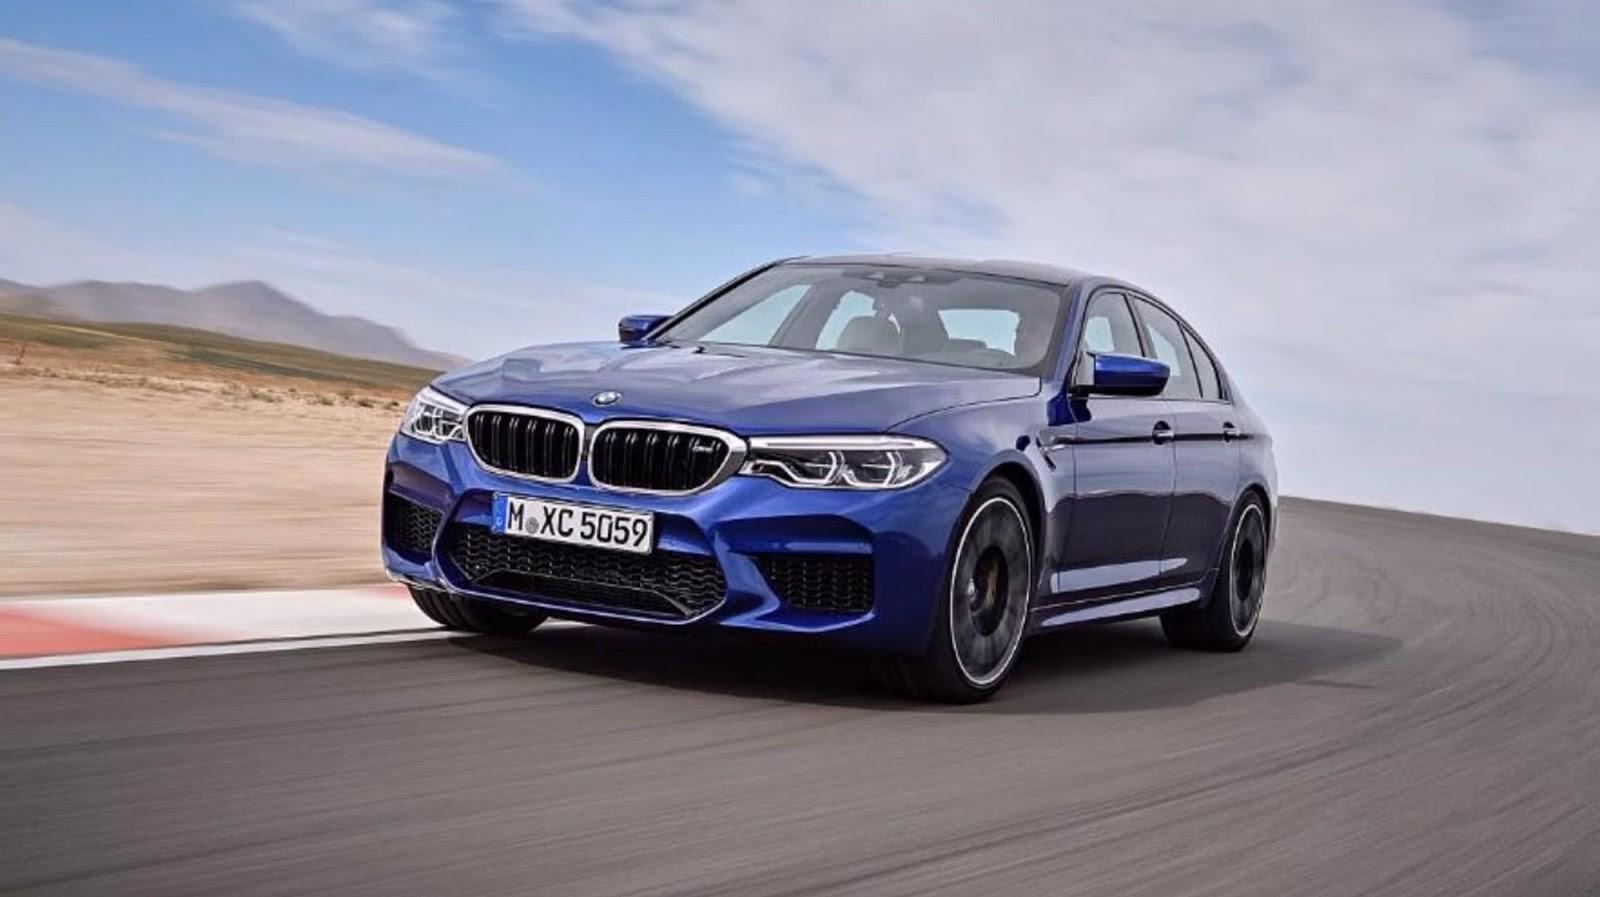 Foto de BMW M5 2018 (filtrado) (2/7)